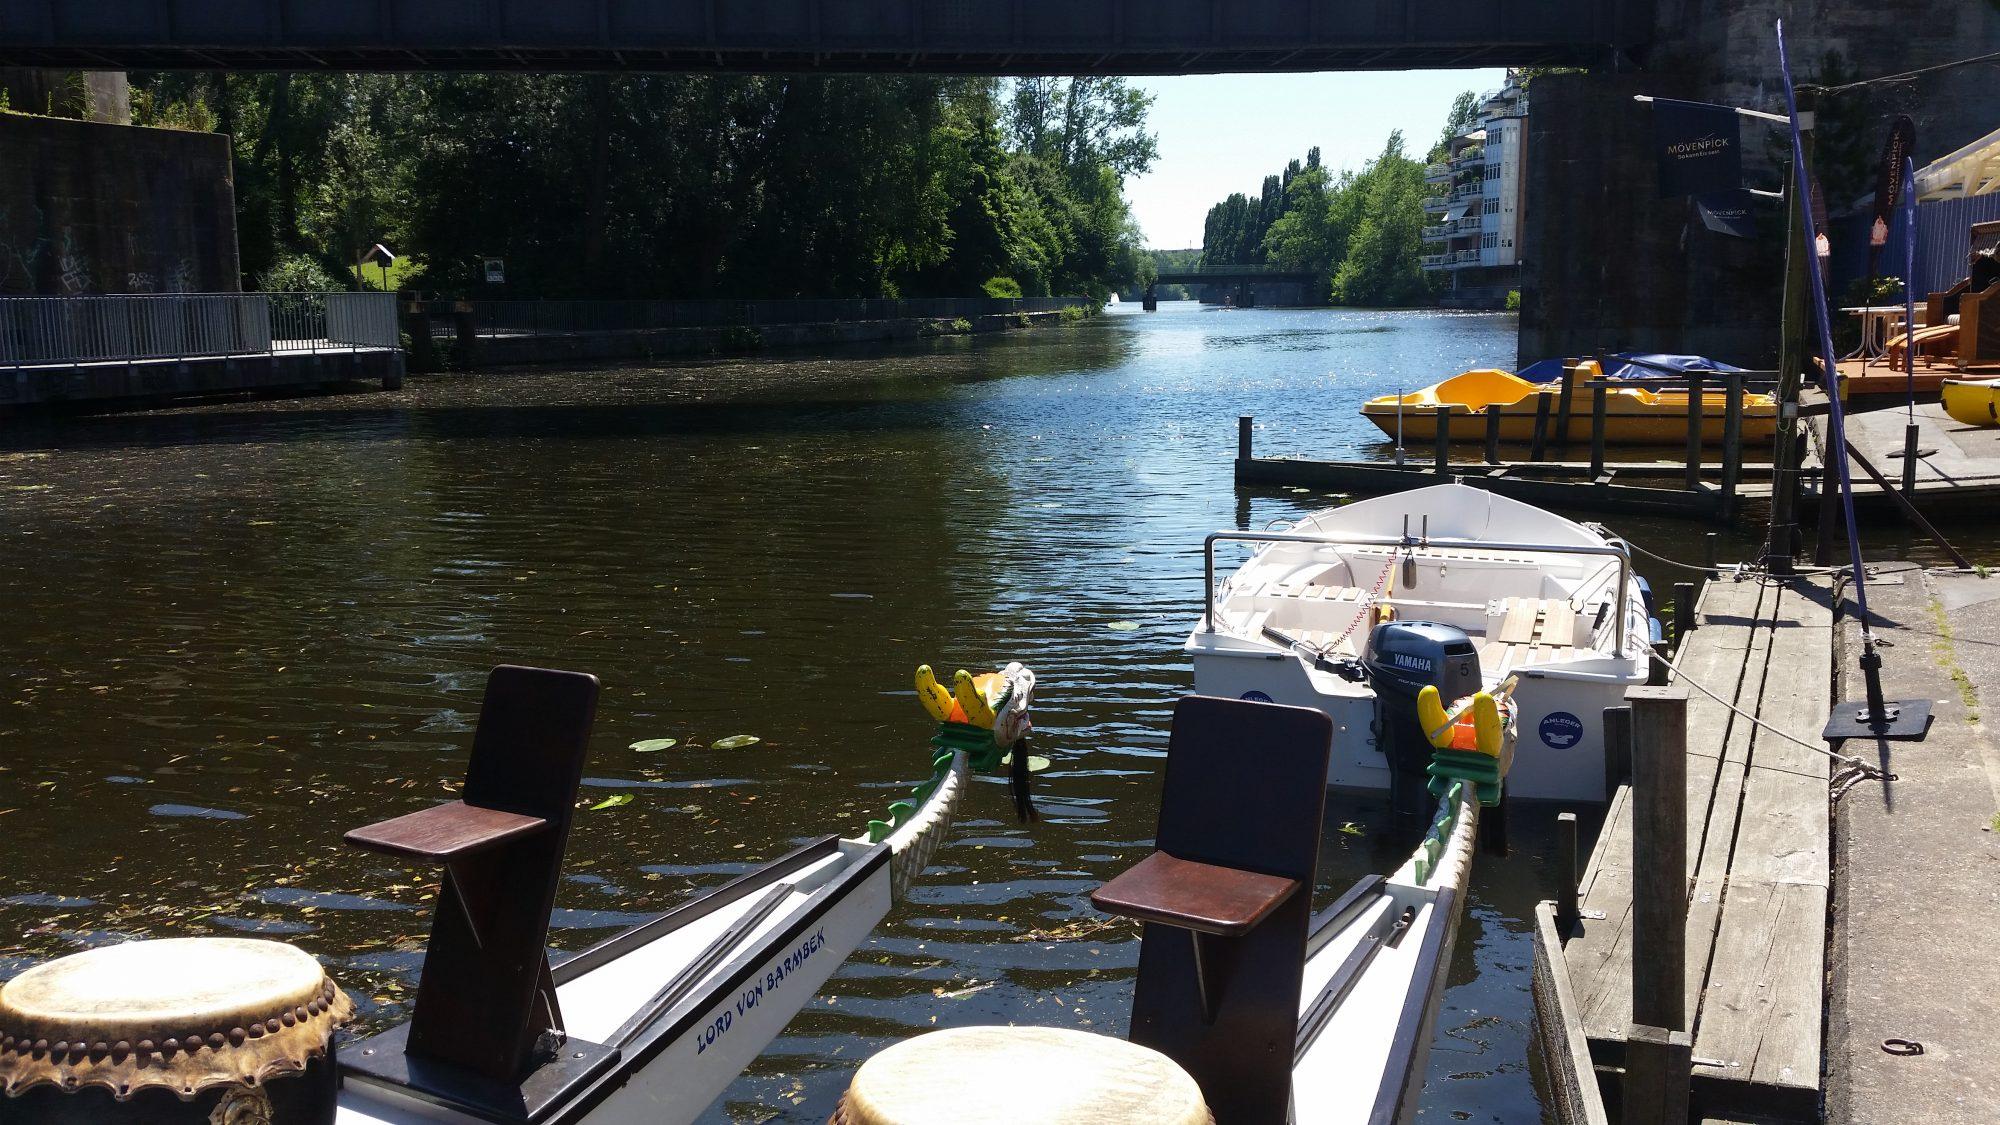 Geschichtsträchtiger Ort für den Drachenboot Sport.